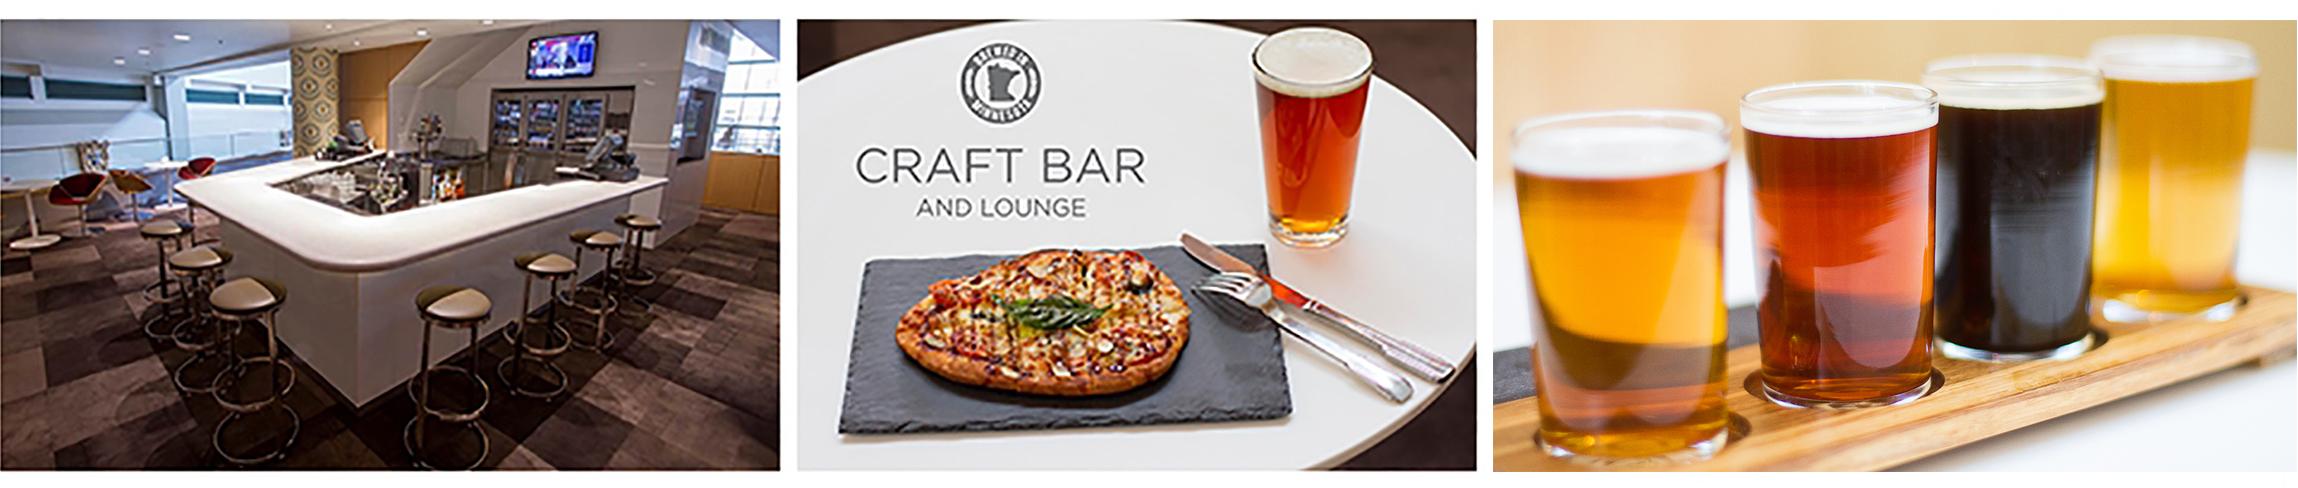 Craft Bar, Margherite Naan Pizza, Draft Beer Flight